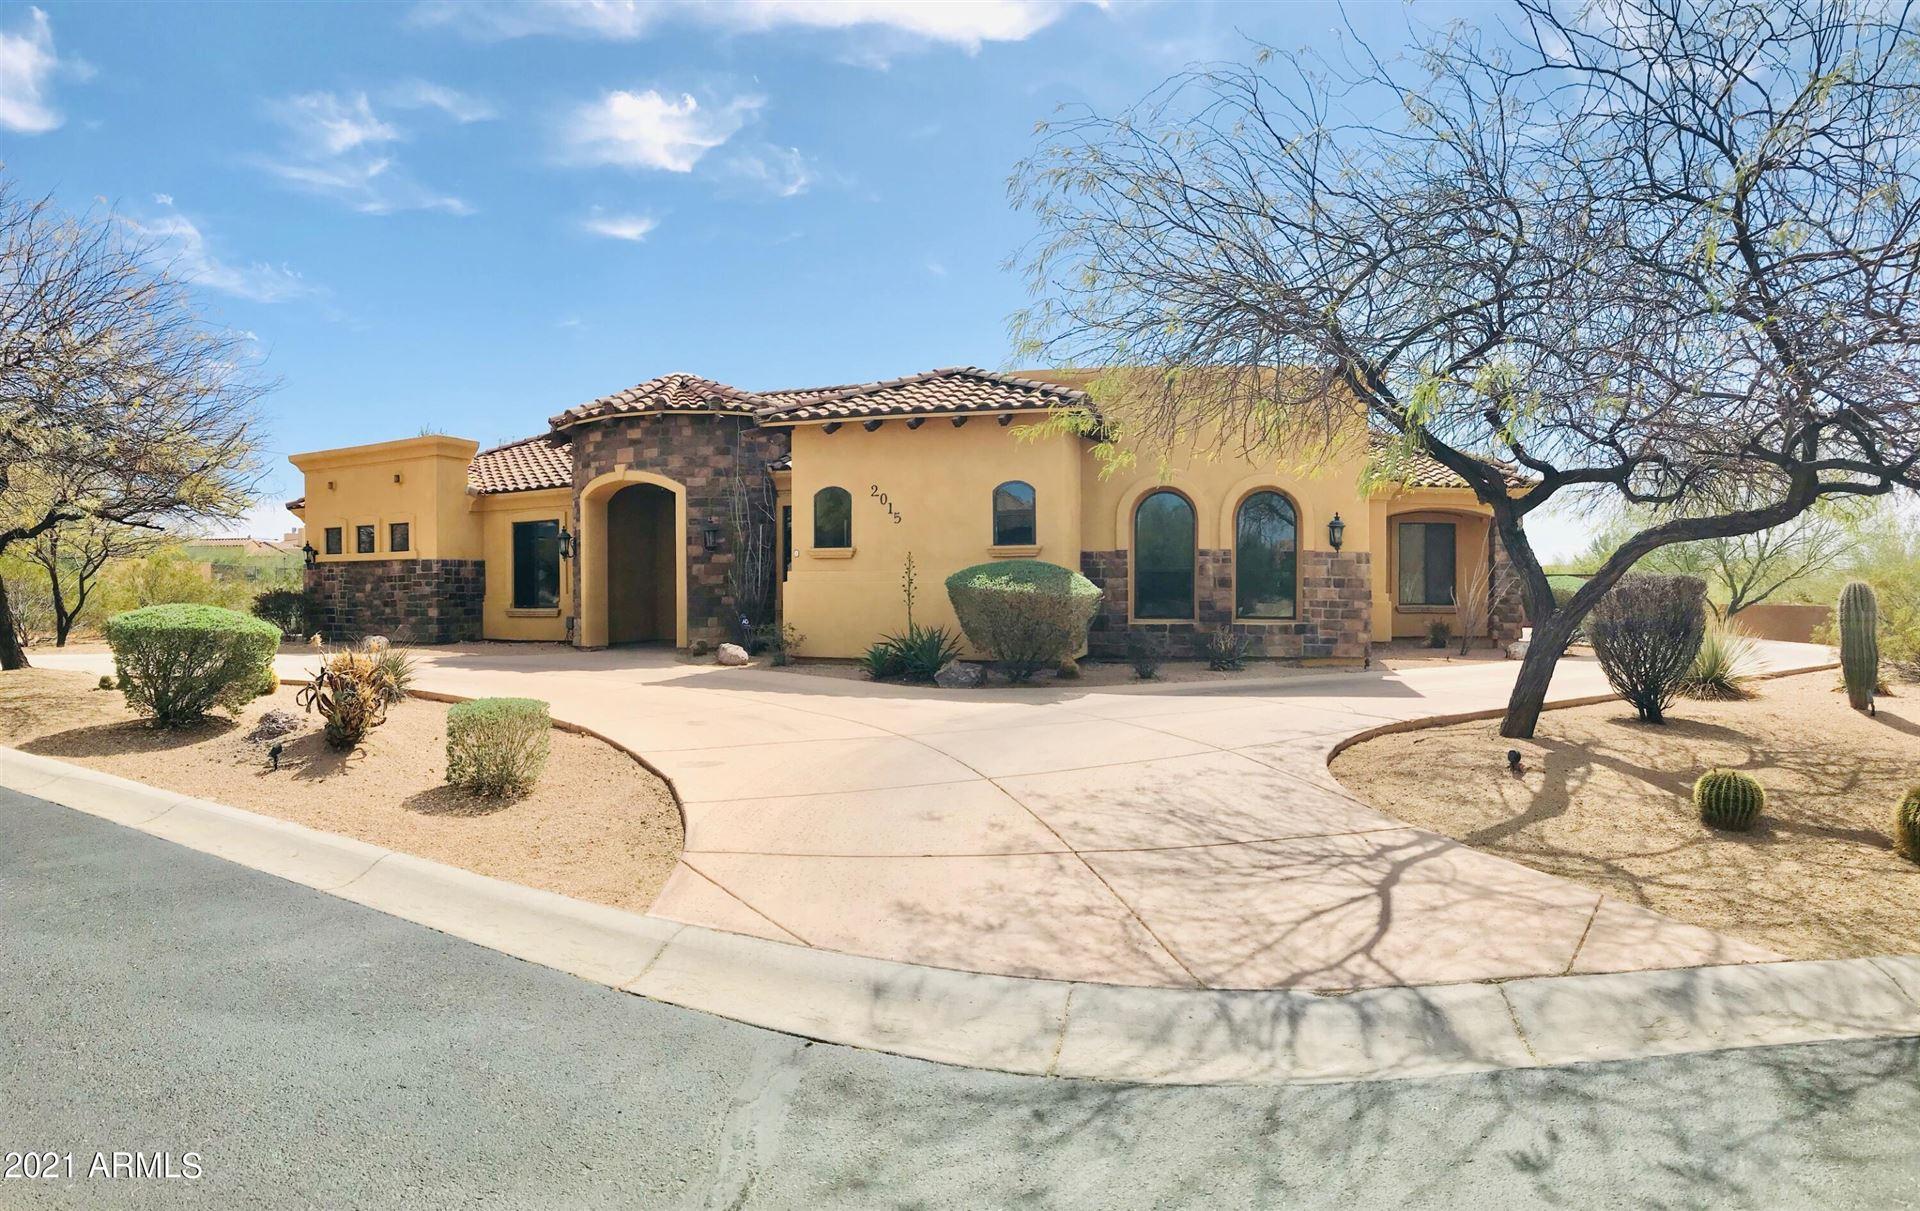 Photo of 2015 N Woodruff --, Mesa, AZ 85207 (MLS # 6203452)